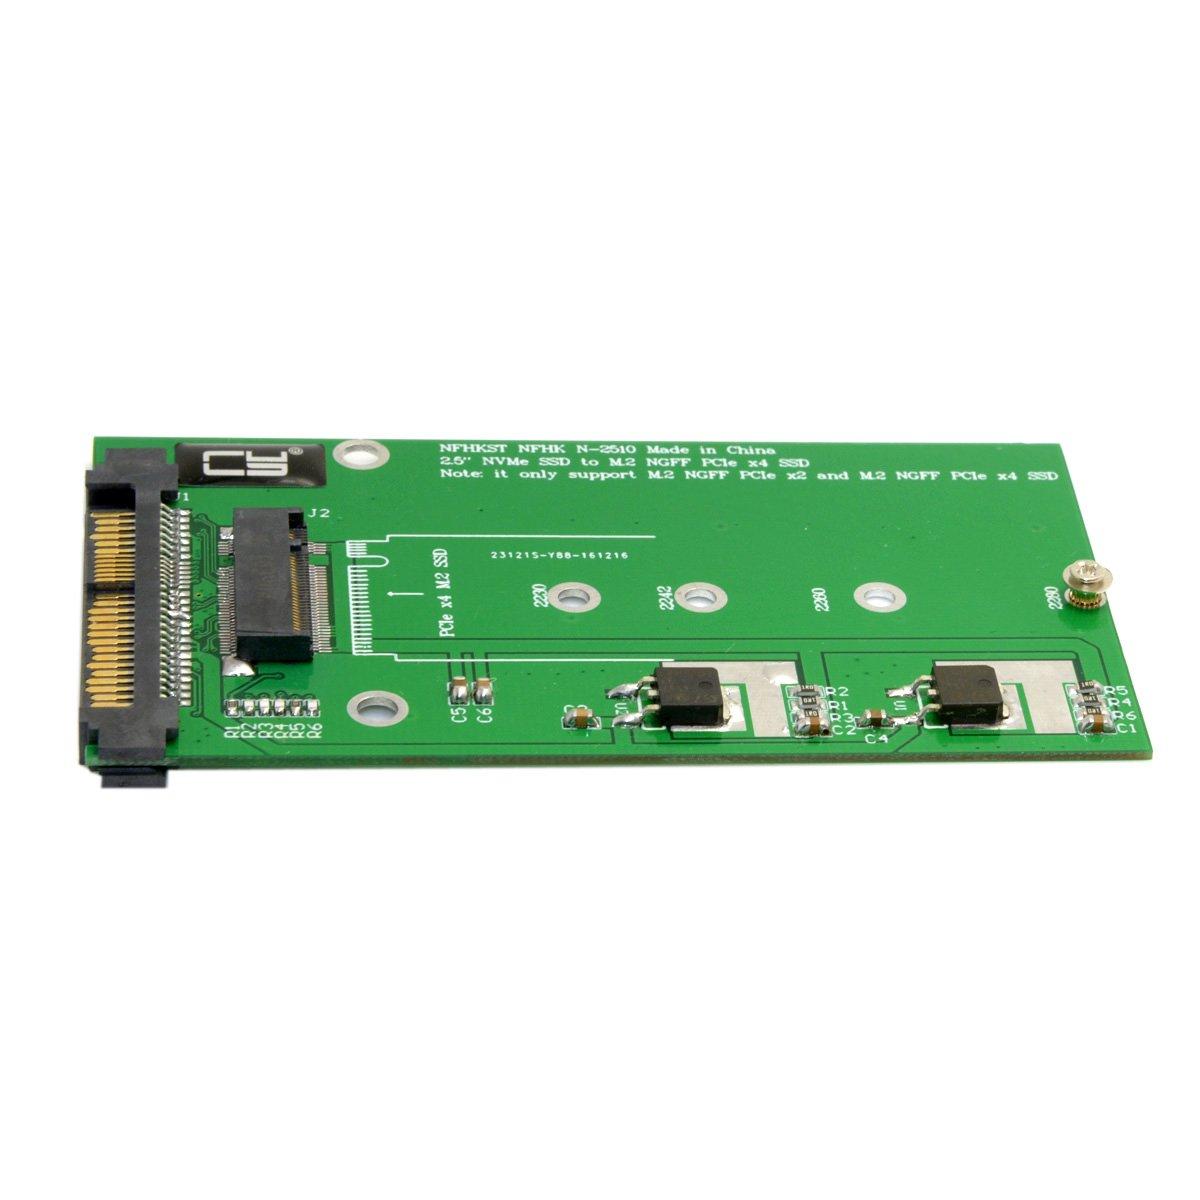 Jser Sff-8639 Nvme U.2 A Ngff M.2 M-key Pcie Ssd Adaptador Para Placa Base Reemplace Intel Ssd 750 P3600 P3700